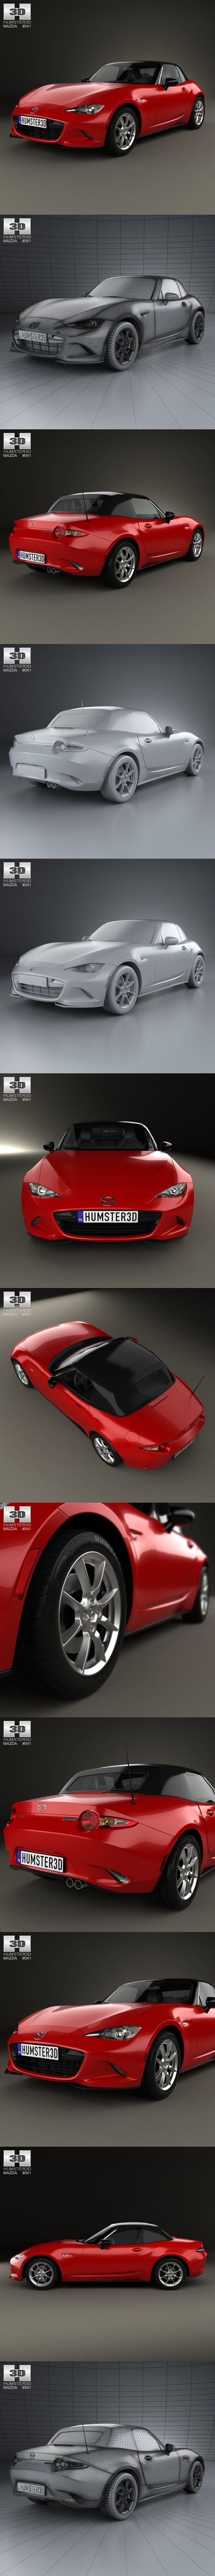 Mazda MX-5 2015. 3D Vehicles